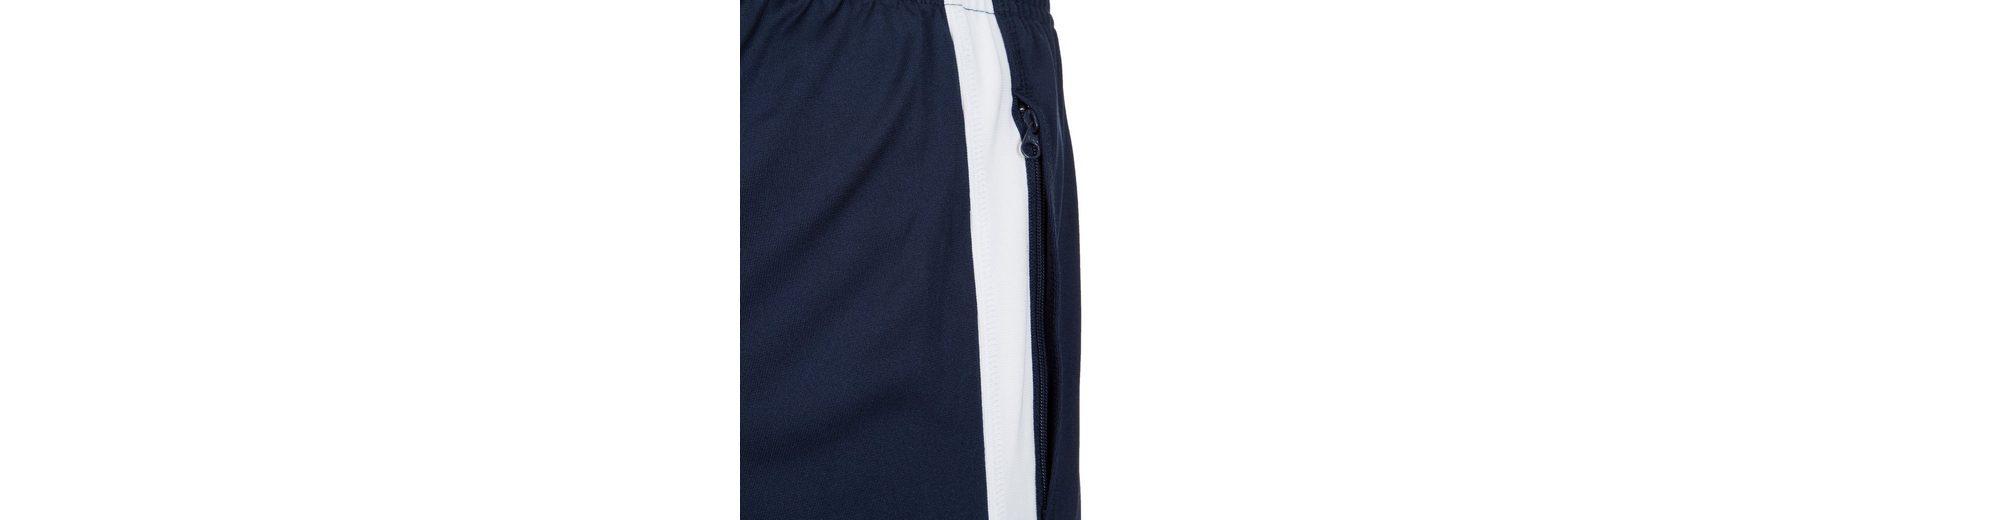 Nike Dry Squad 17 Trainingshose Damen Rabatt Mit Kreditkarte OrIvuXl